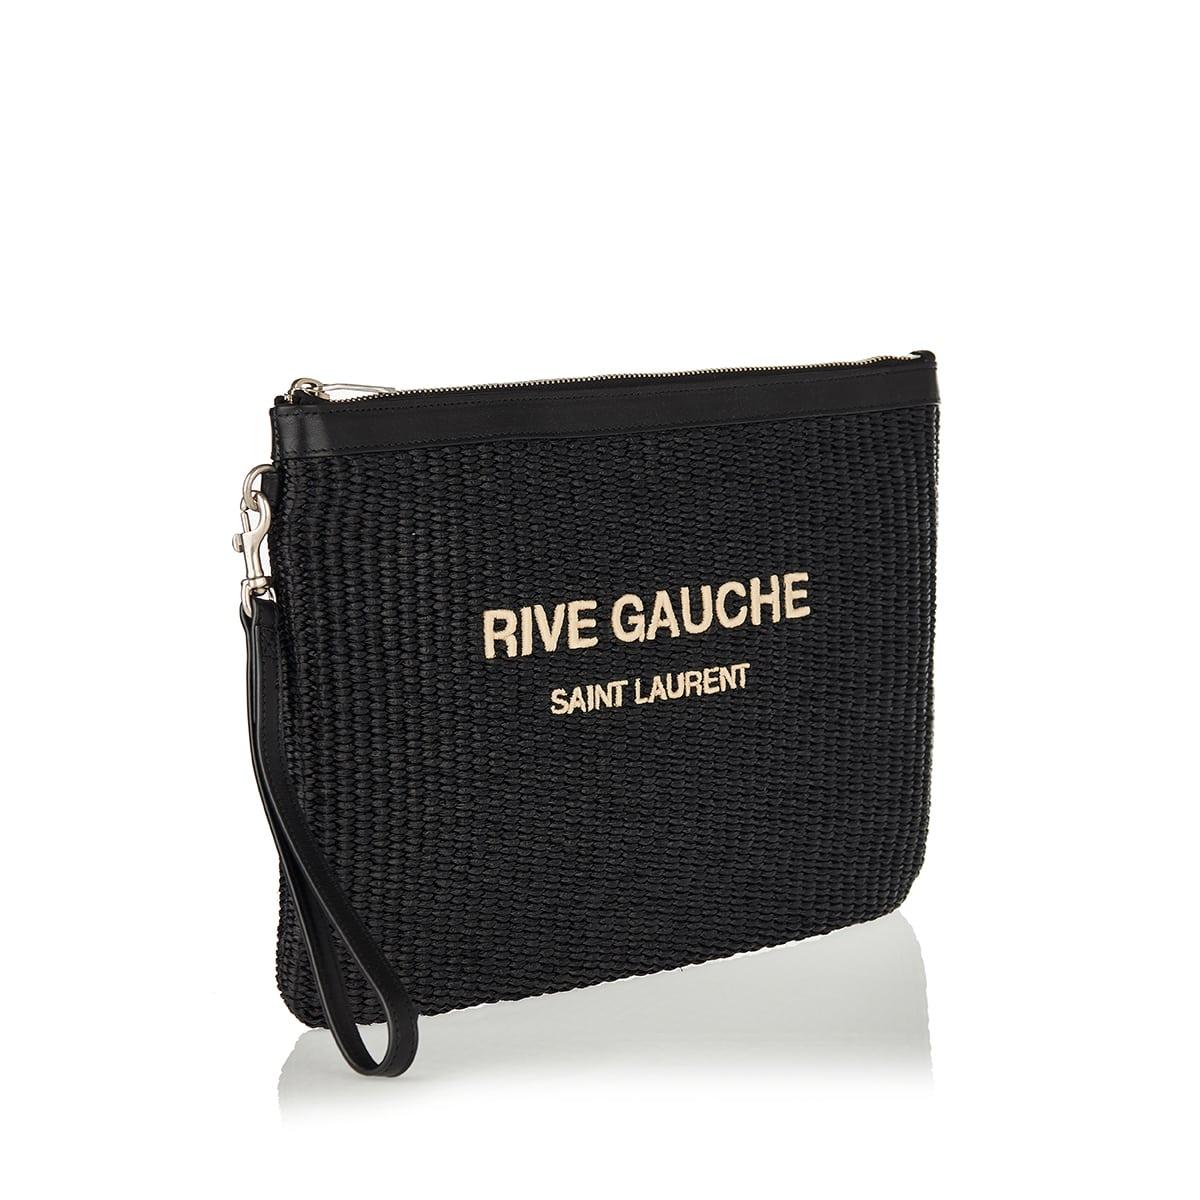 Rive Gauche raffia pouch